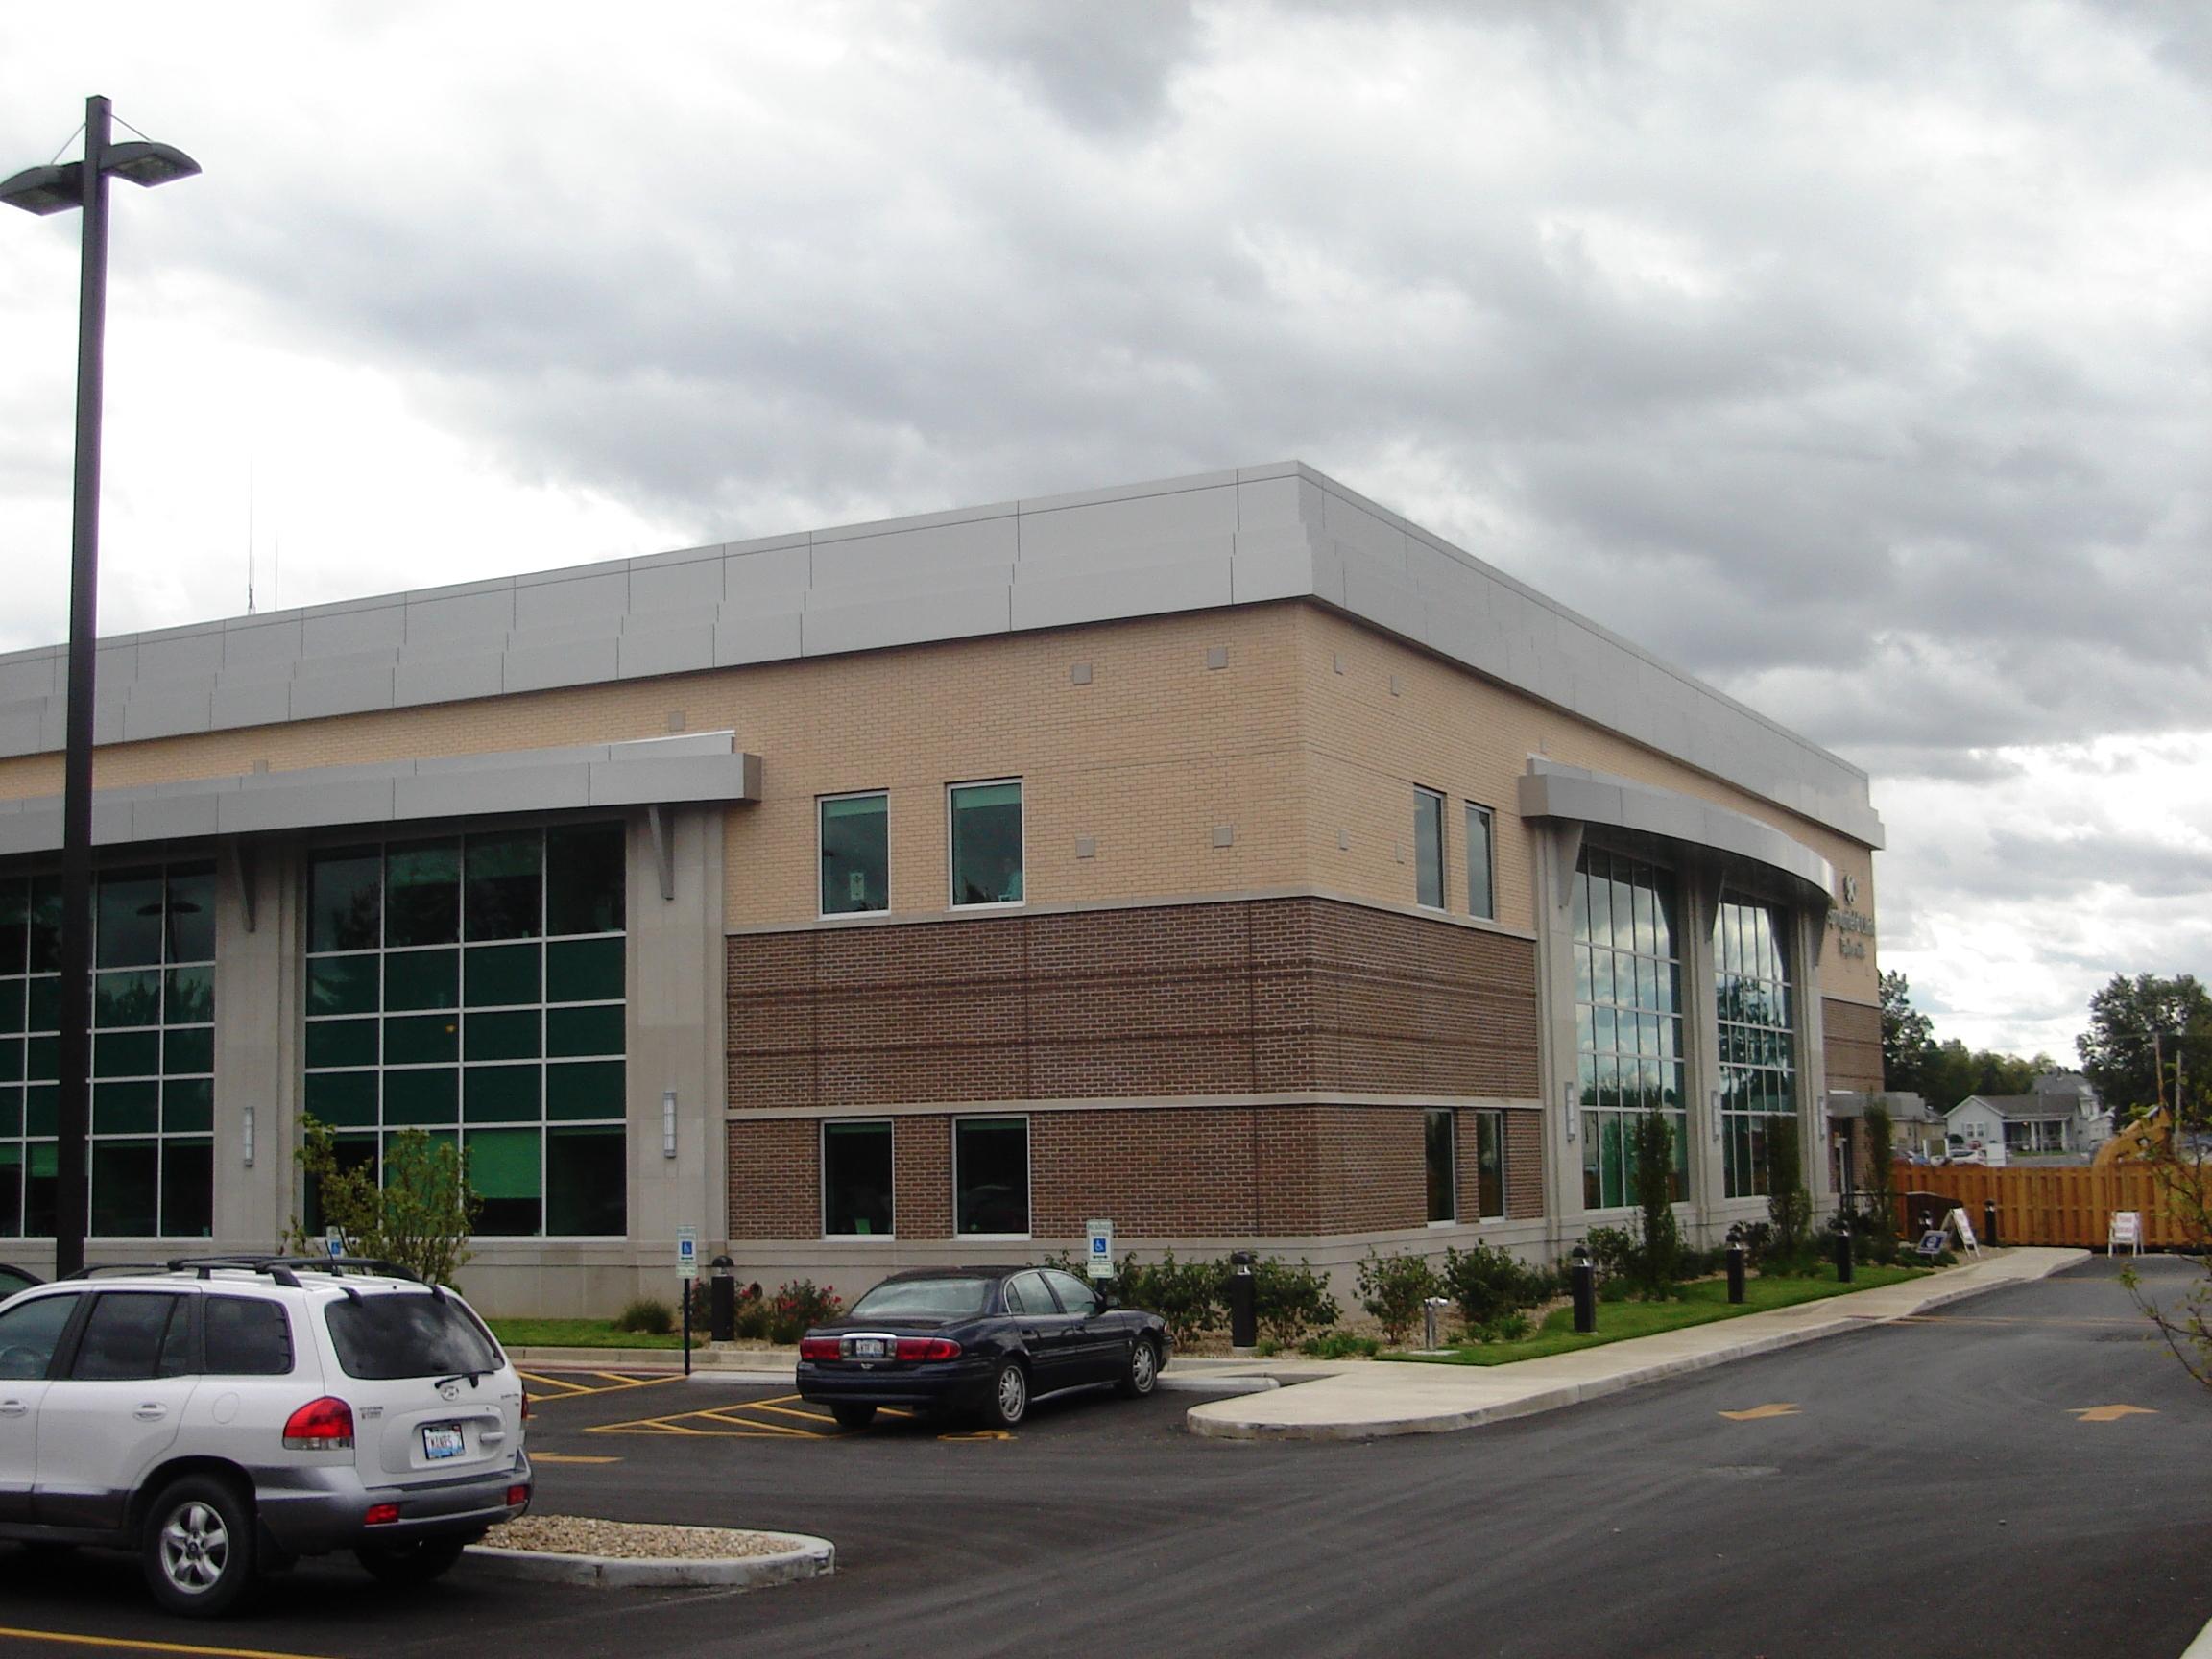 Taylorville Memorial Hospital (Taylorville)